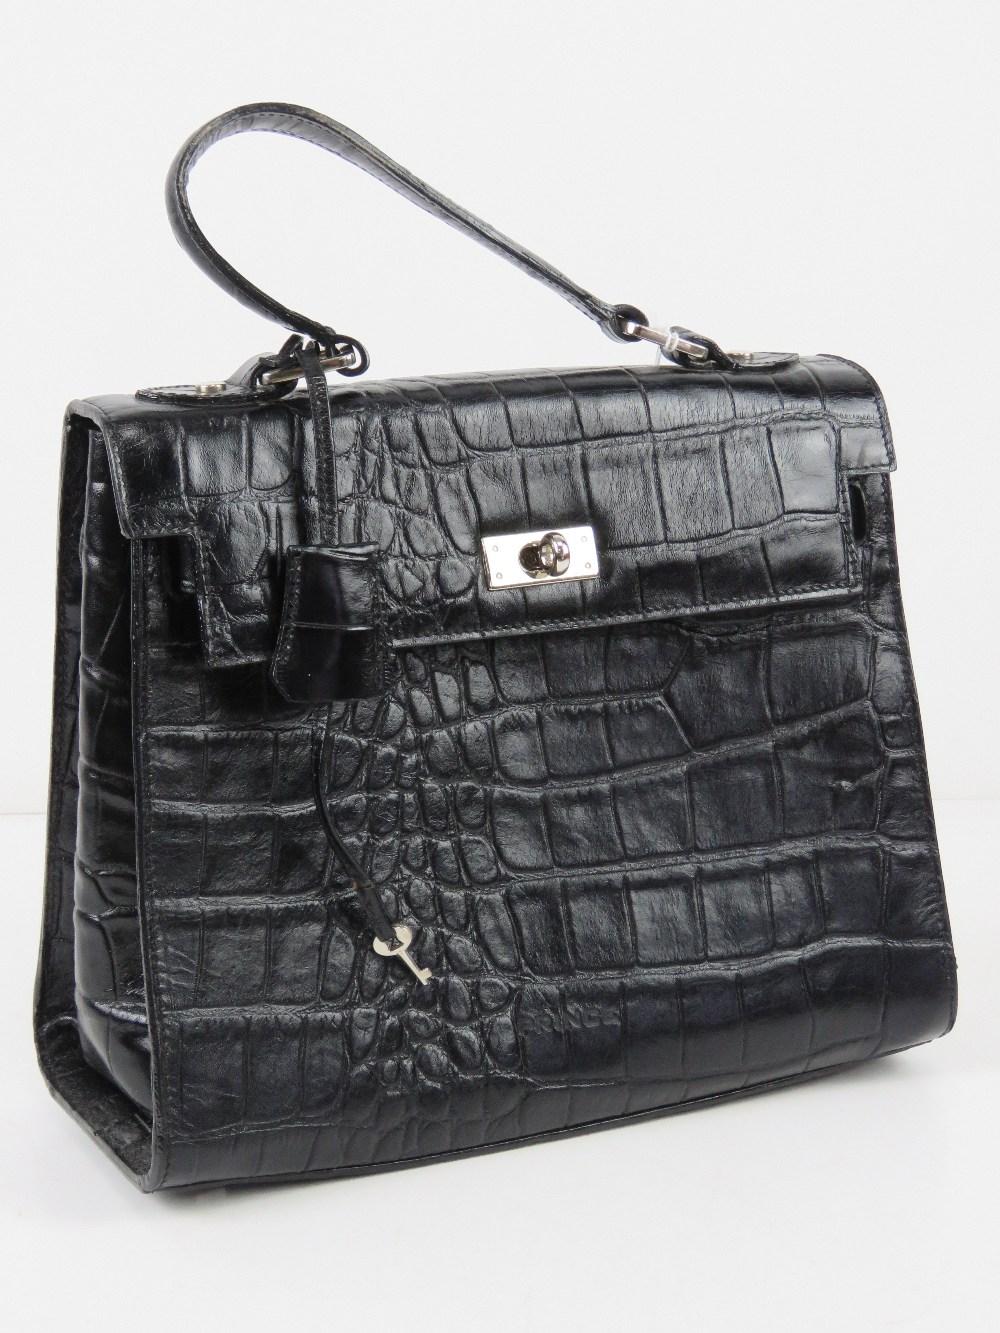 A black faux crocodile skin handbag havi